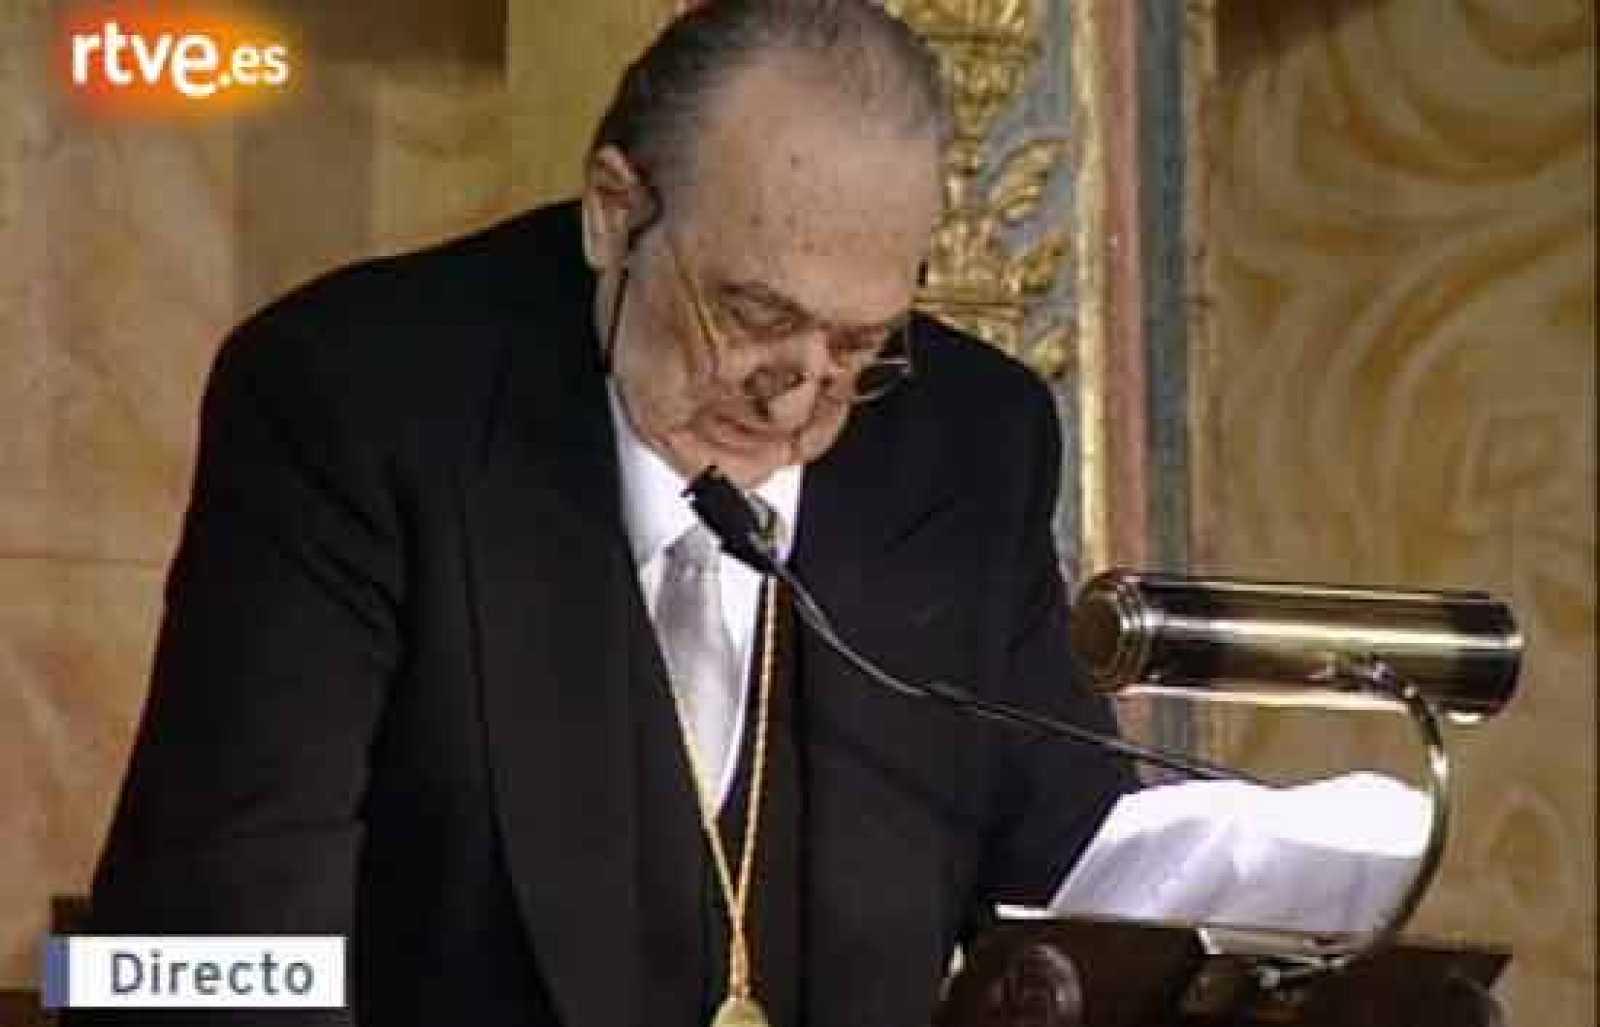 Discurso Rafael Sánchez Ferlosio, Premio Cervantes 2004